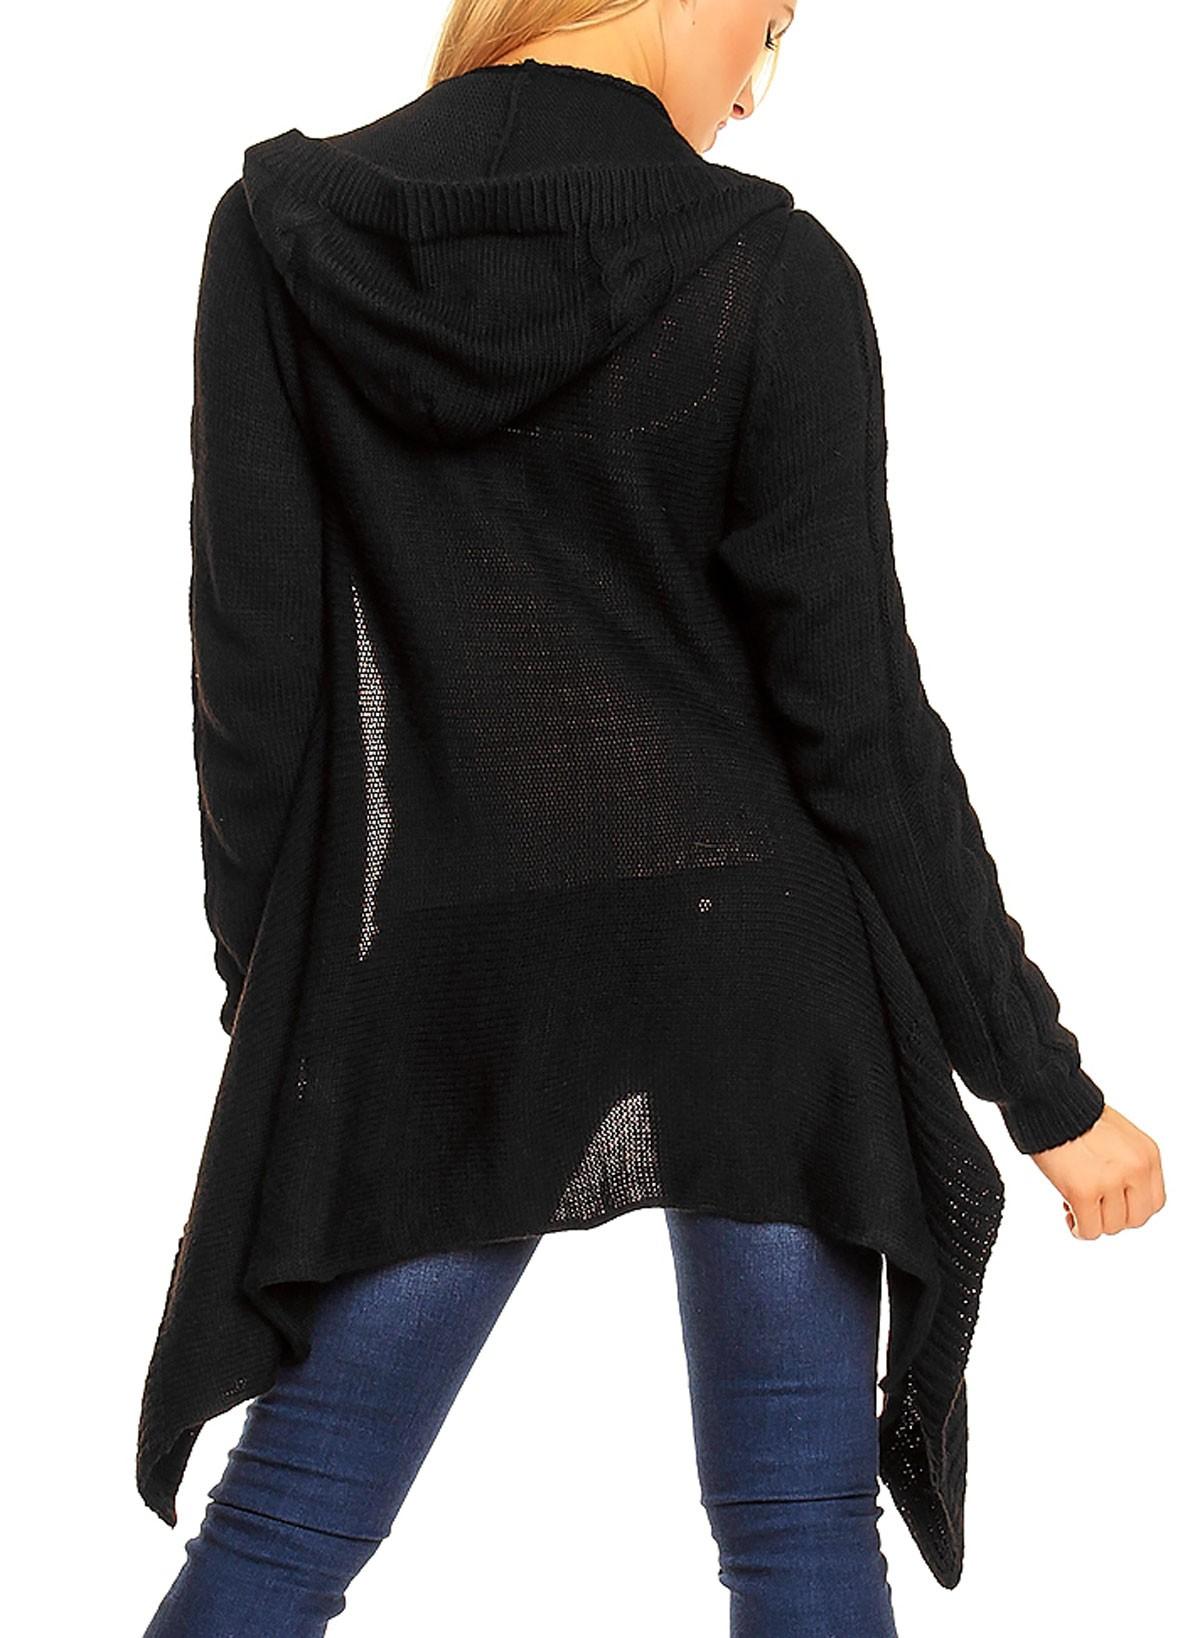 Exceptionnel femme habille XS86